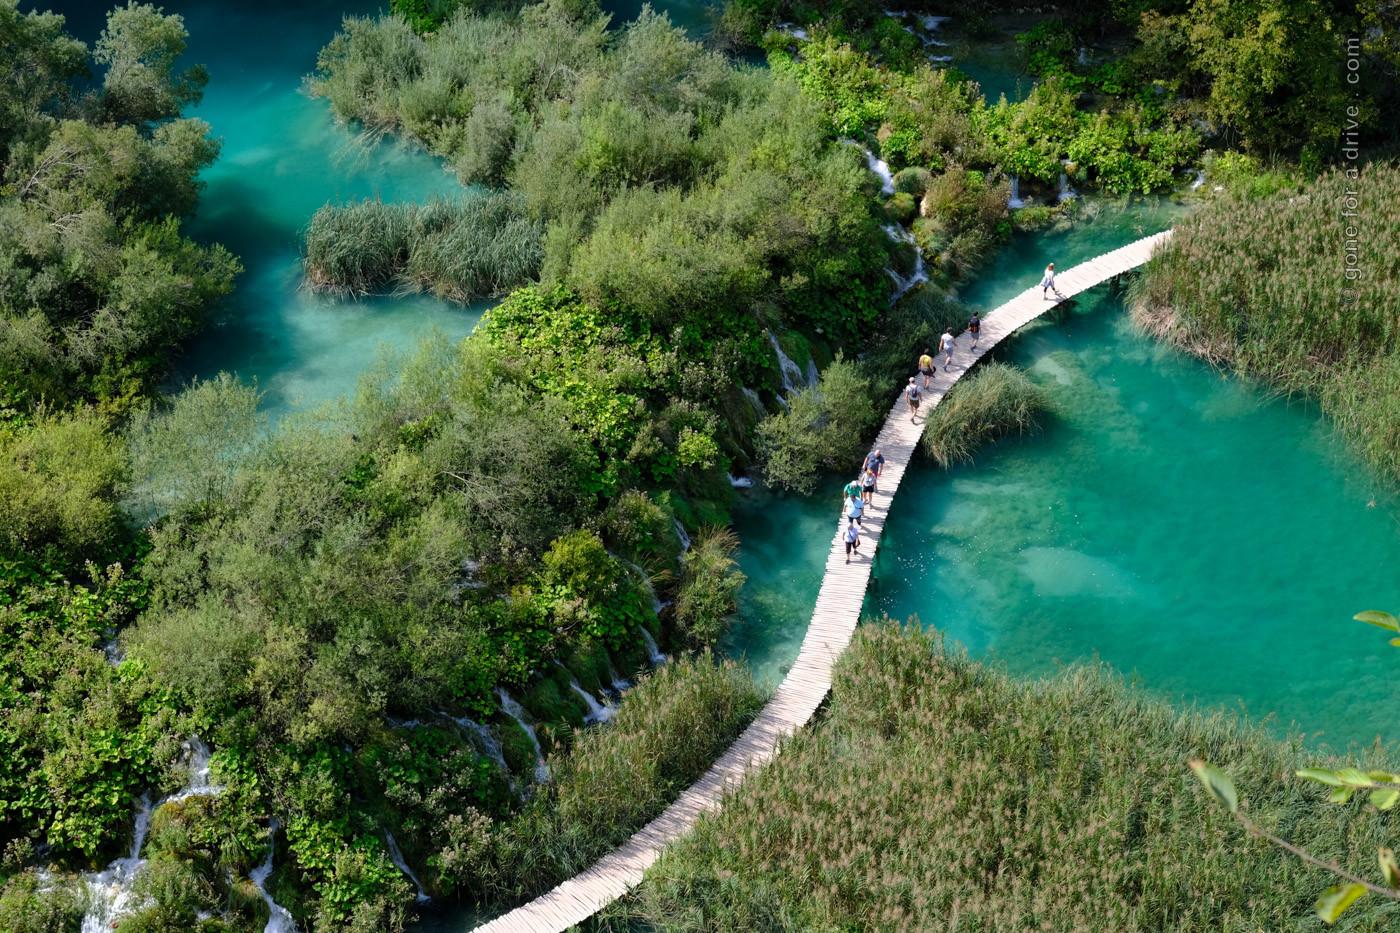 Fußgängersteg im Nationalpark Plitvicer Seen